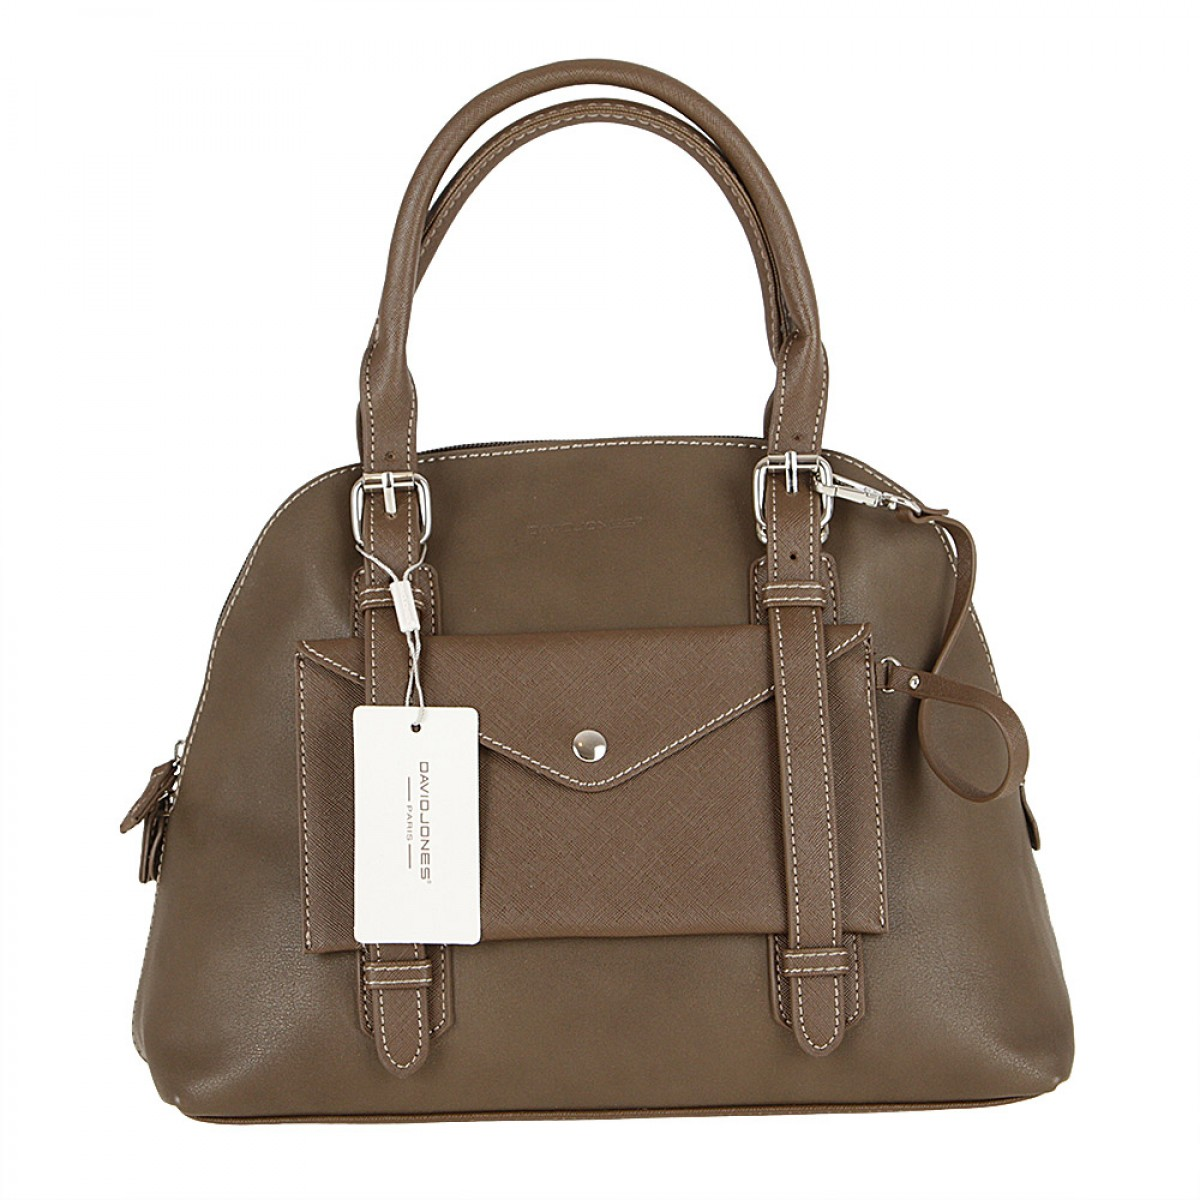 Жіноча сумка David Jones 5633-2 D.TAUPE